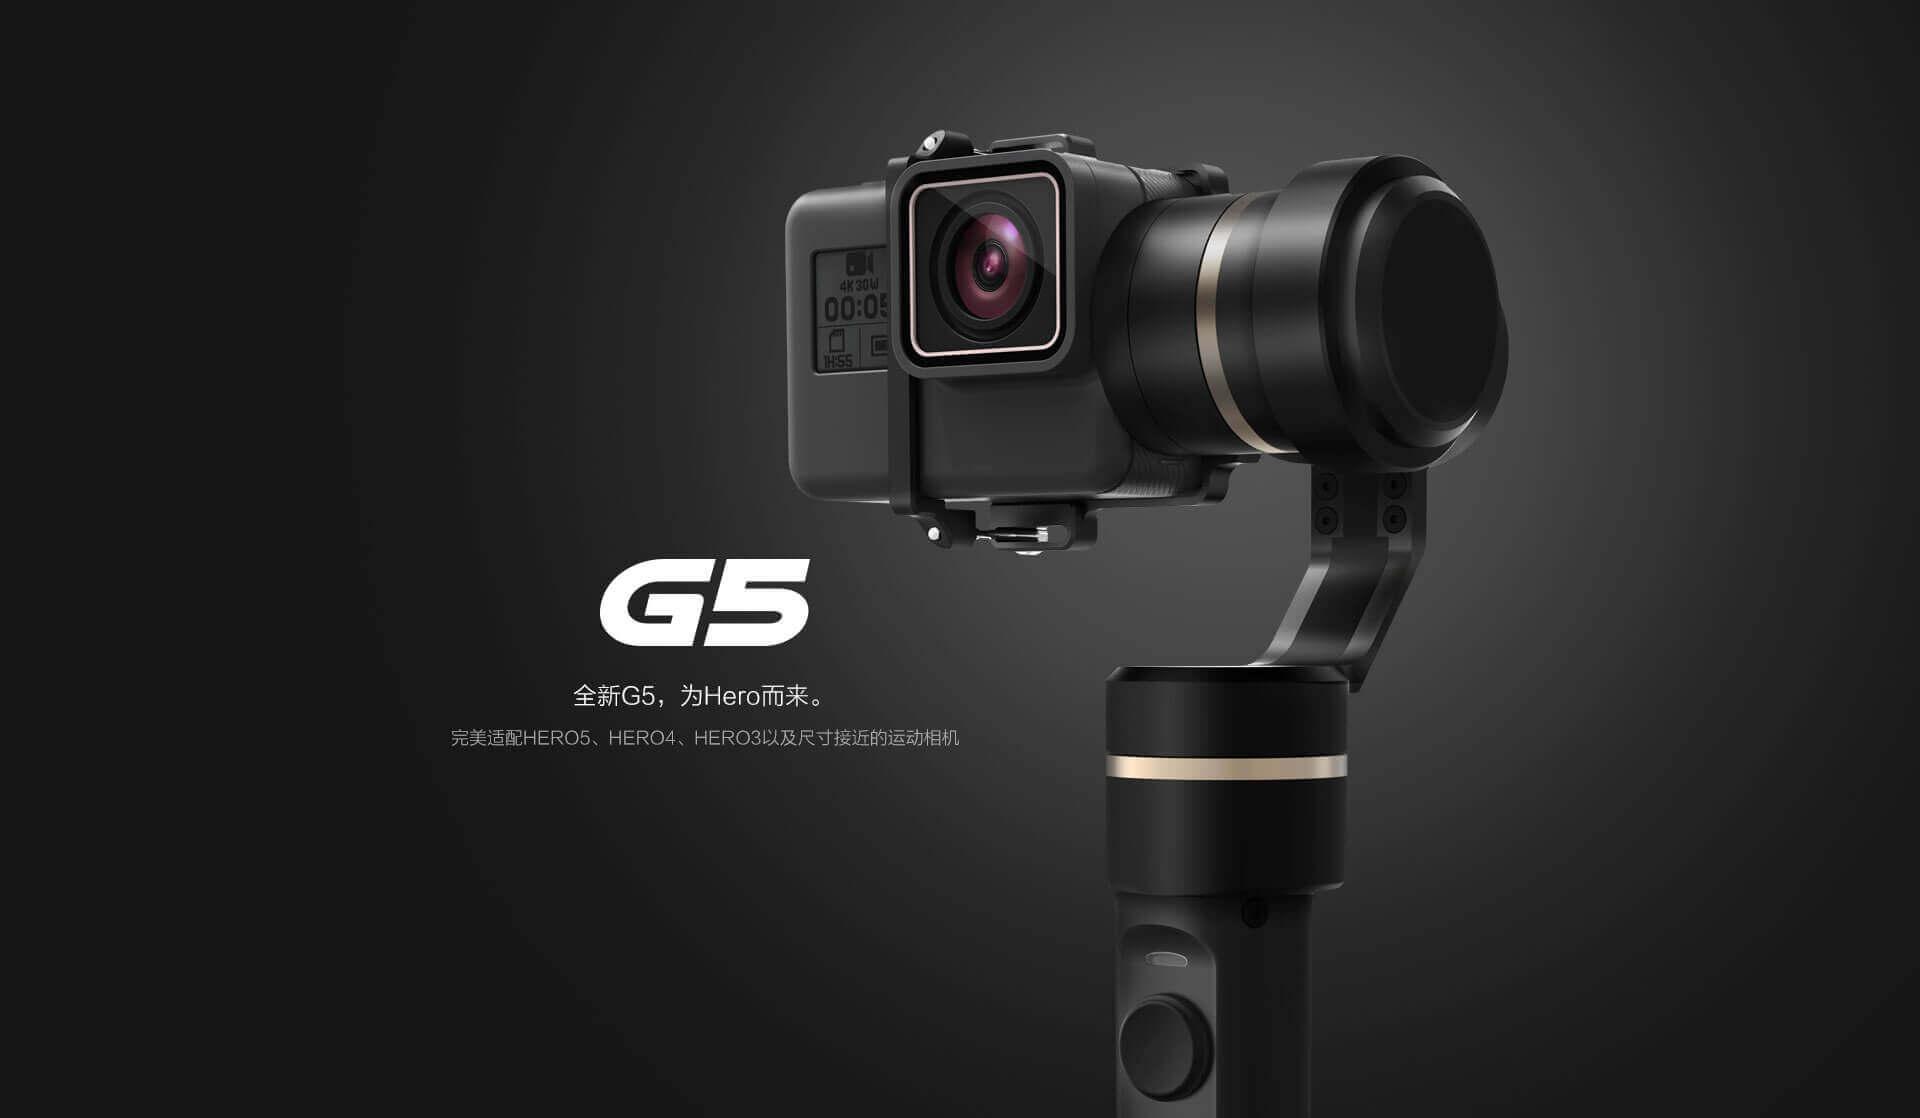 G5_01.jpg